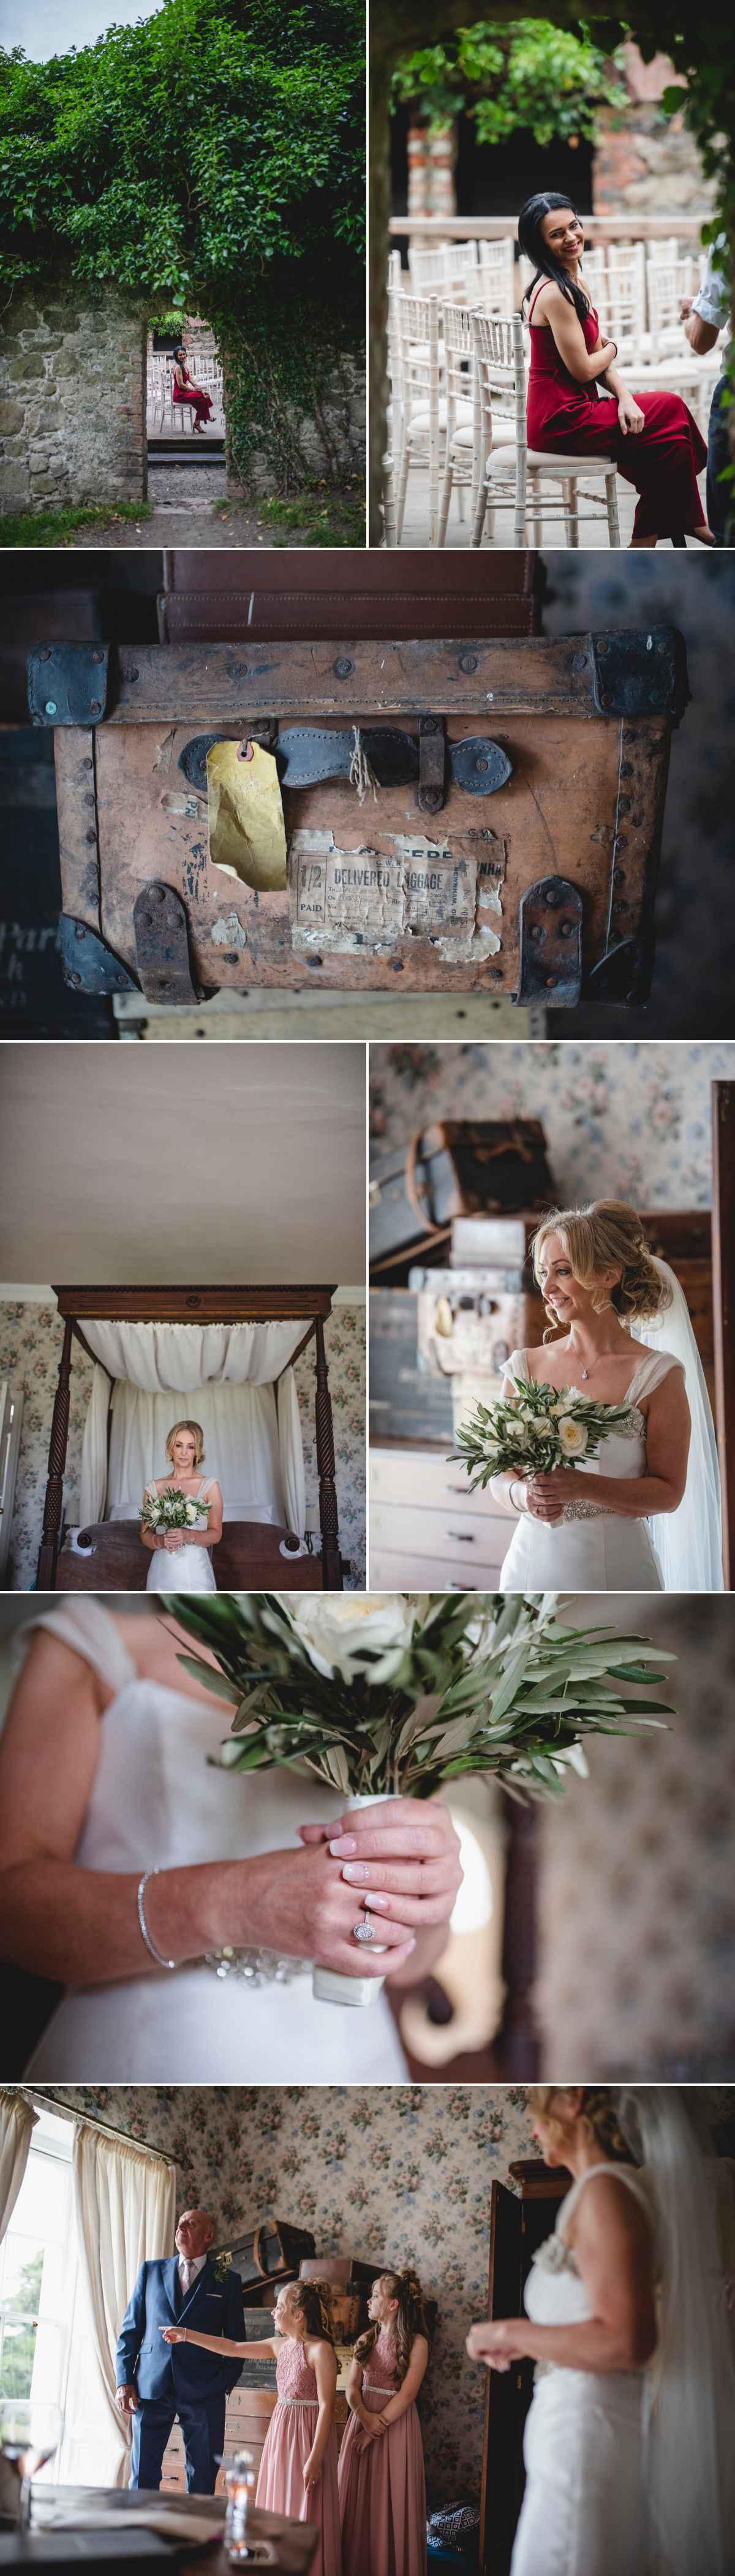 Rustic Wedding Ireland Photographer 04.jpg